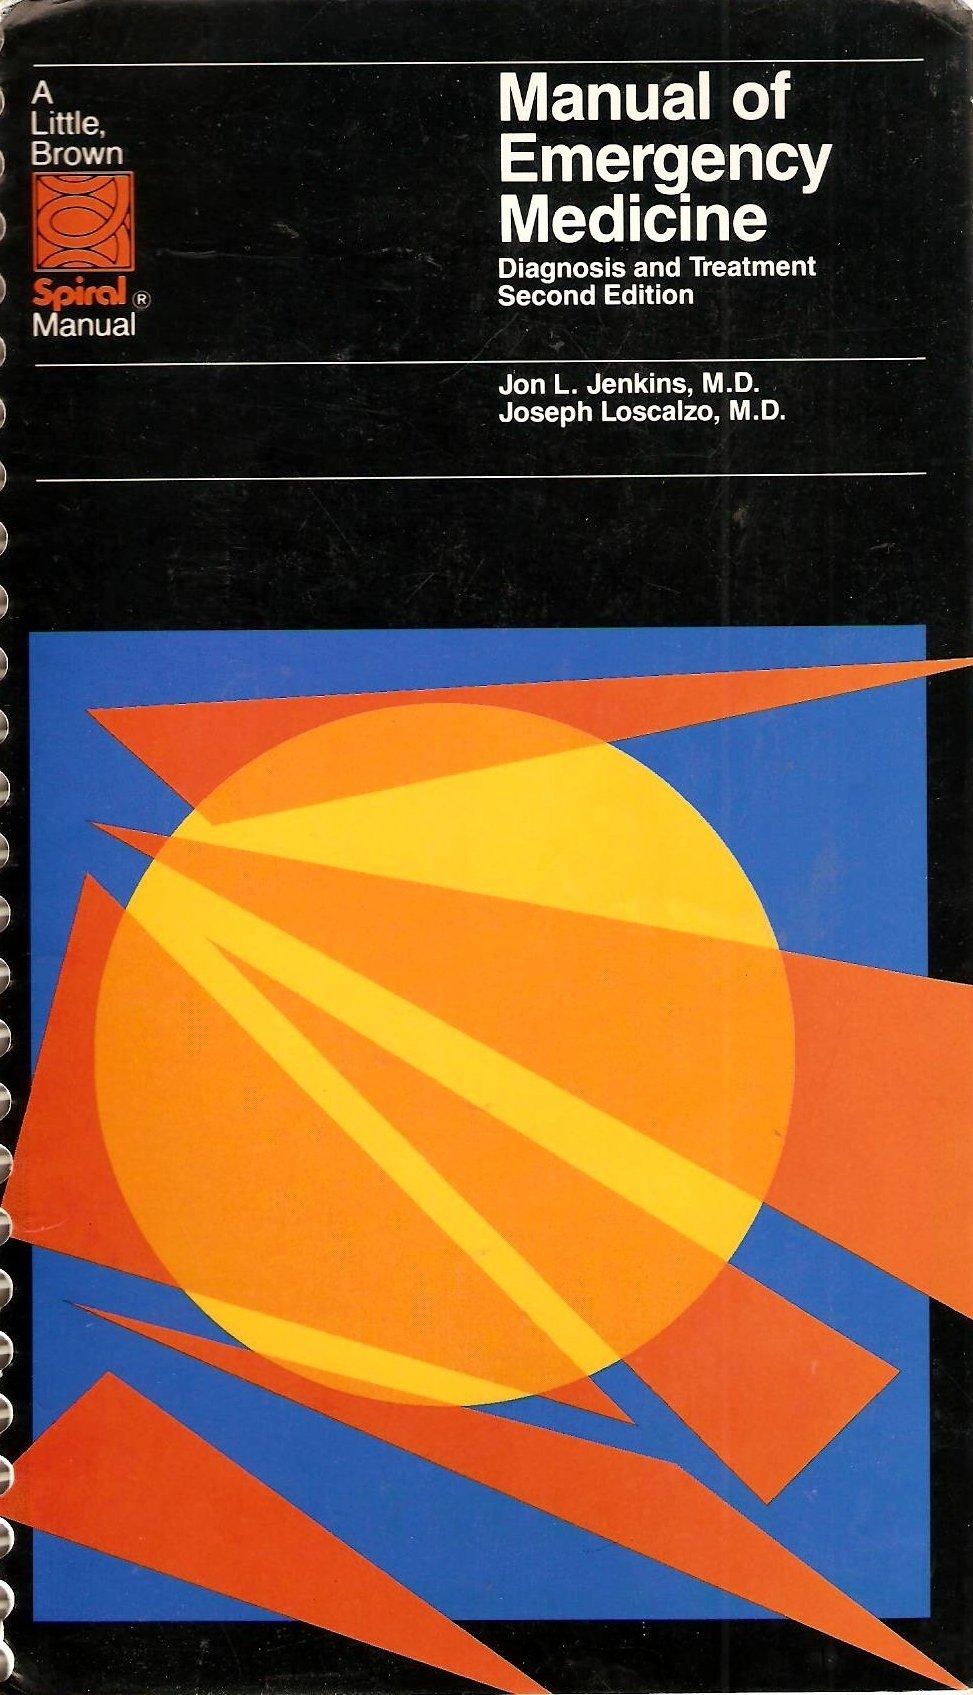 Manual of Emergency Medicine: Diagnosis and Treatment: Jon L. Jenkins,  Joseph Loscalzo: 9780316460552: Textbooks: Amazon Canada